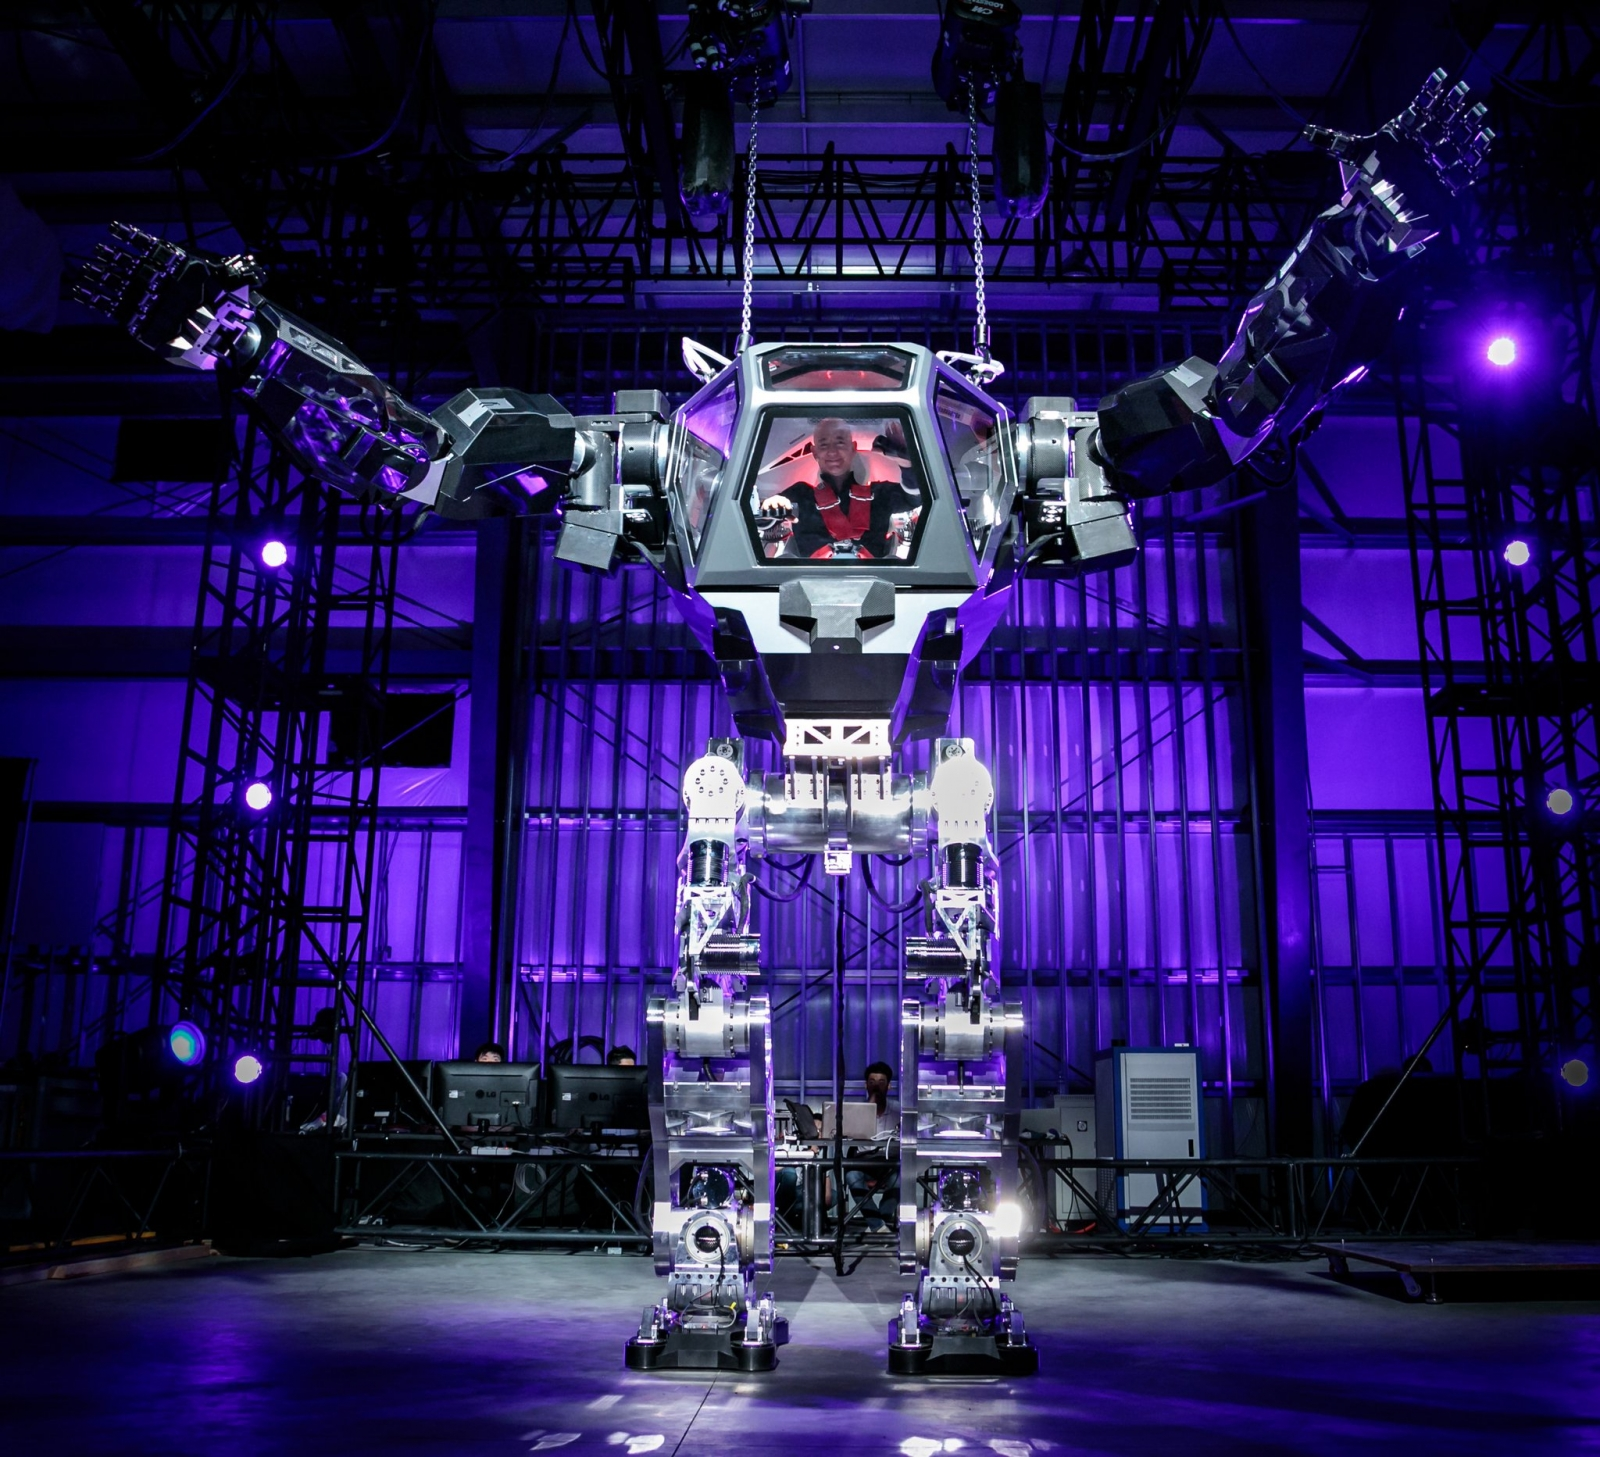 Jeff Bezos in the giant Method-2 robot